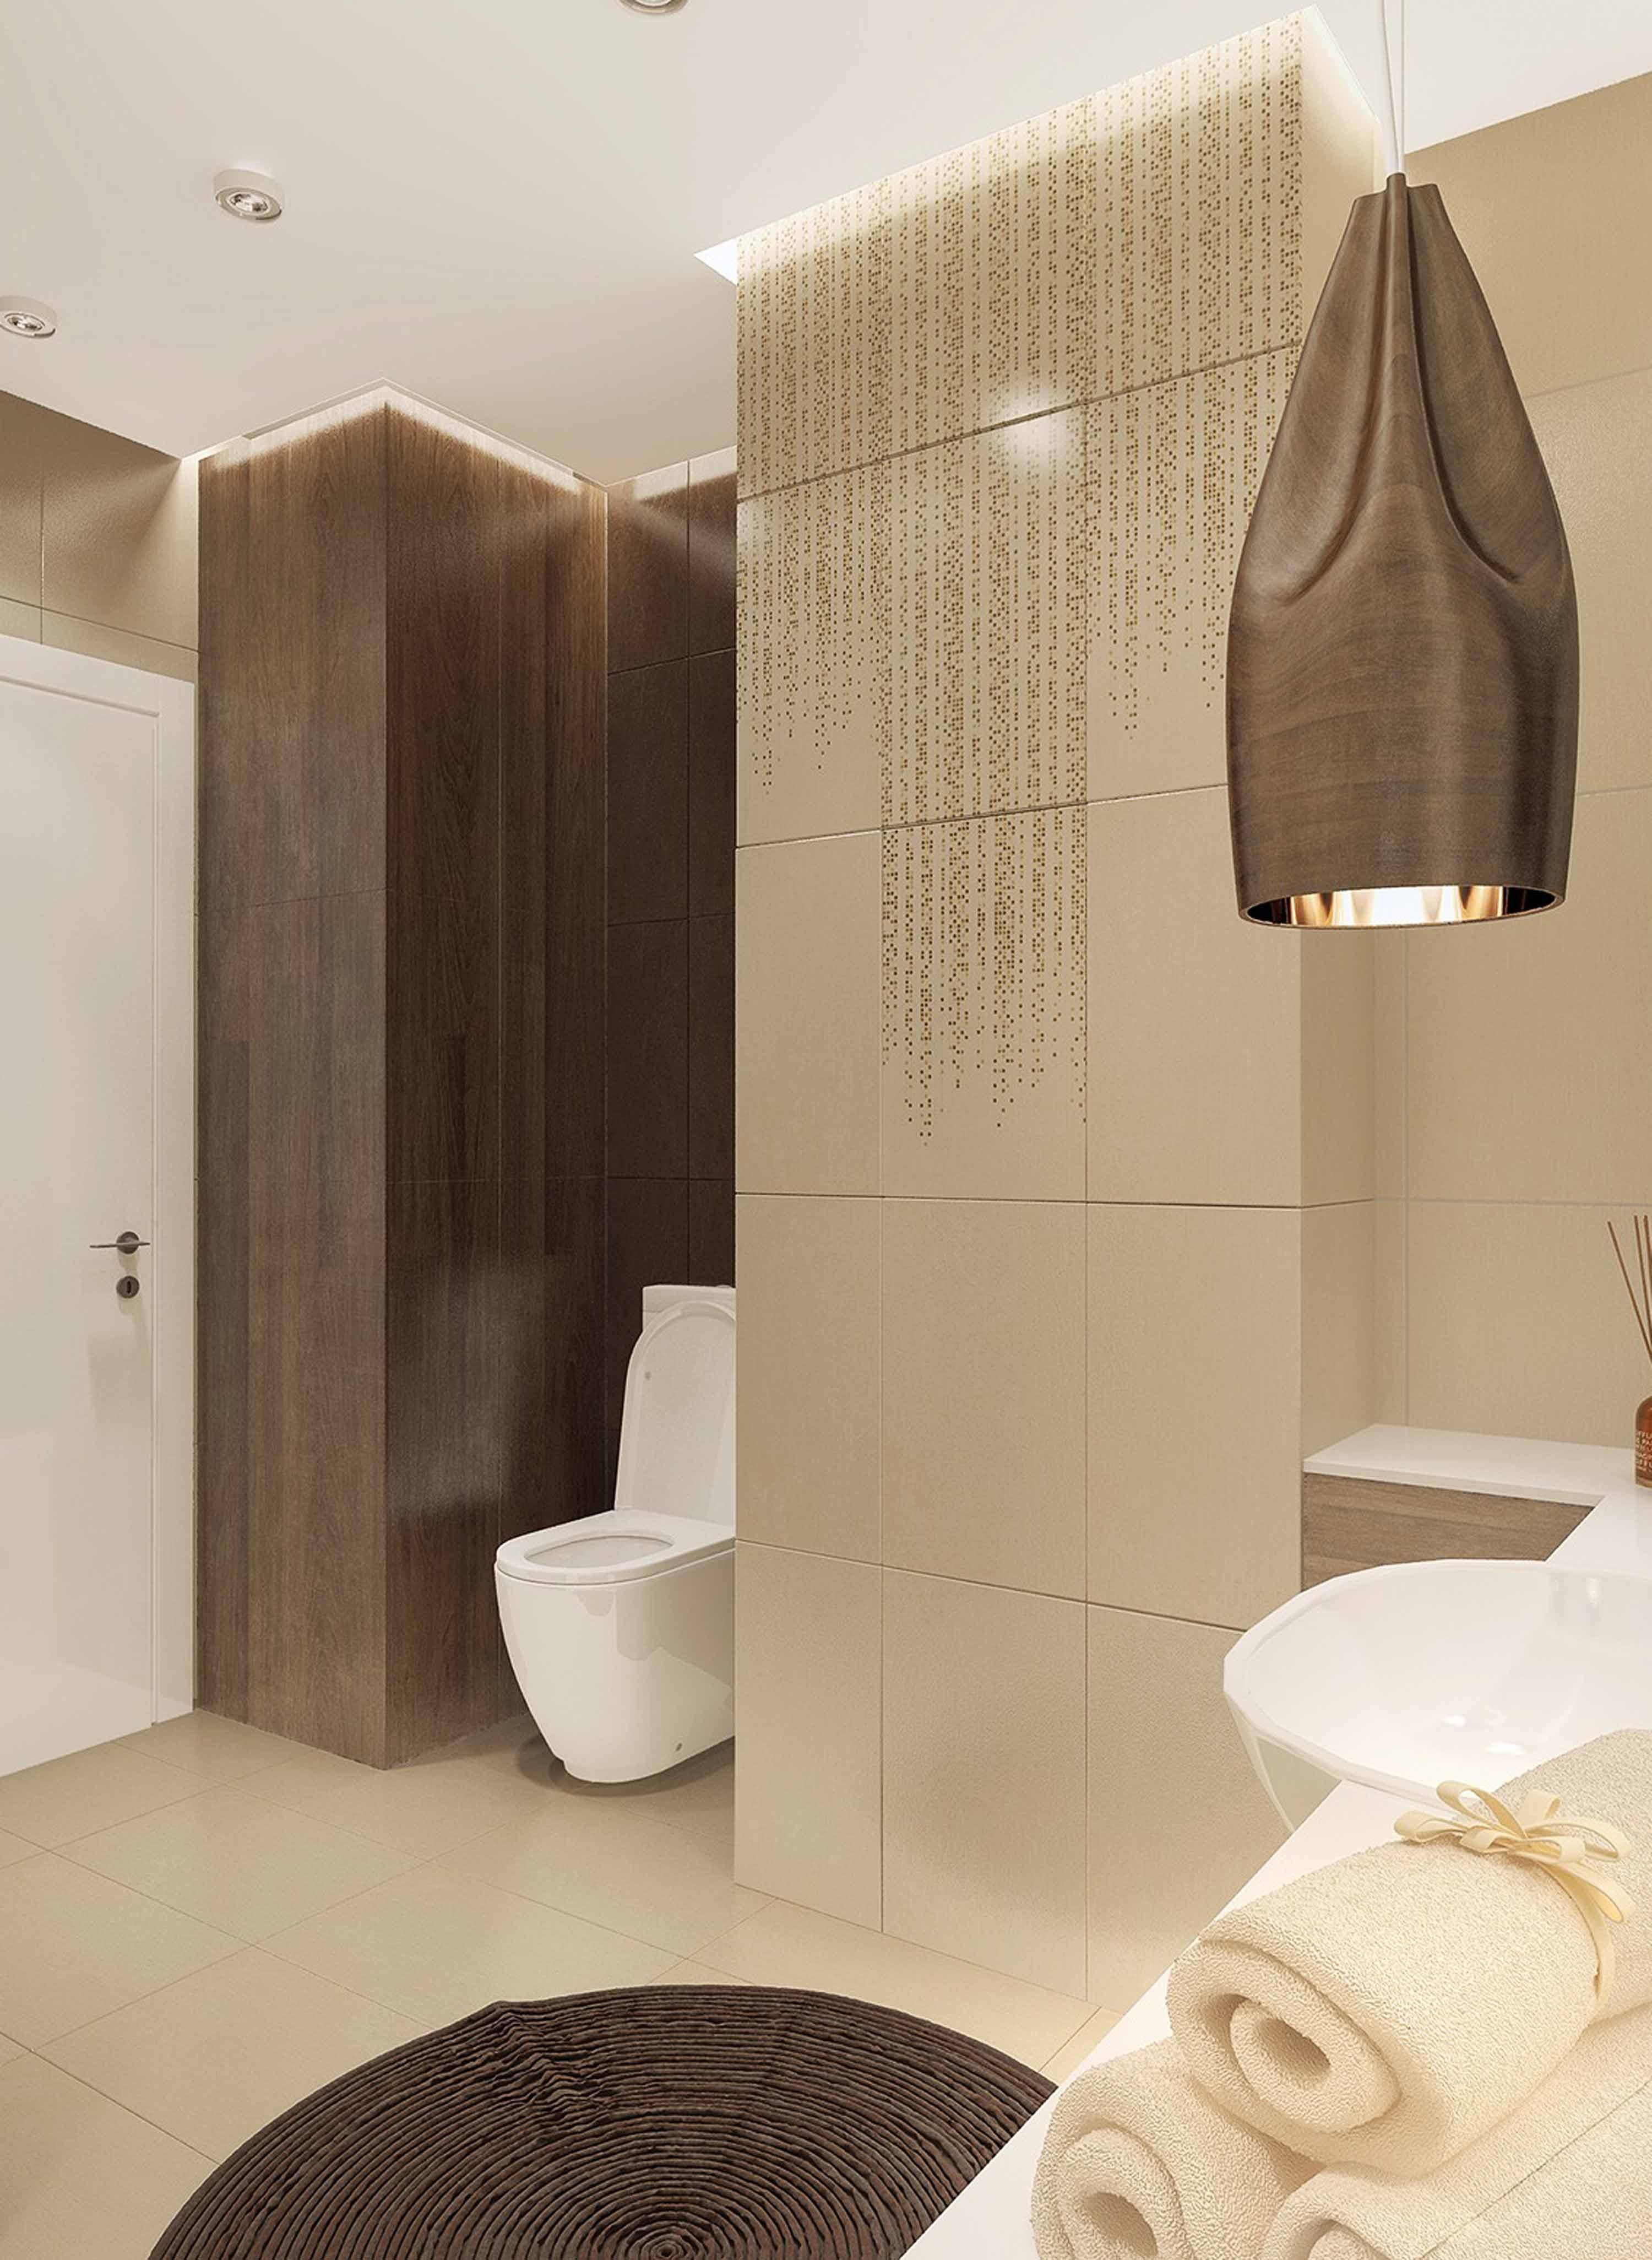 excellent bathroom wall tile ideas design-Amazing Bathroom Wall Tile Ideas Architecture